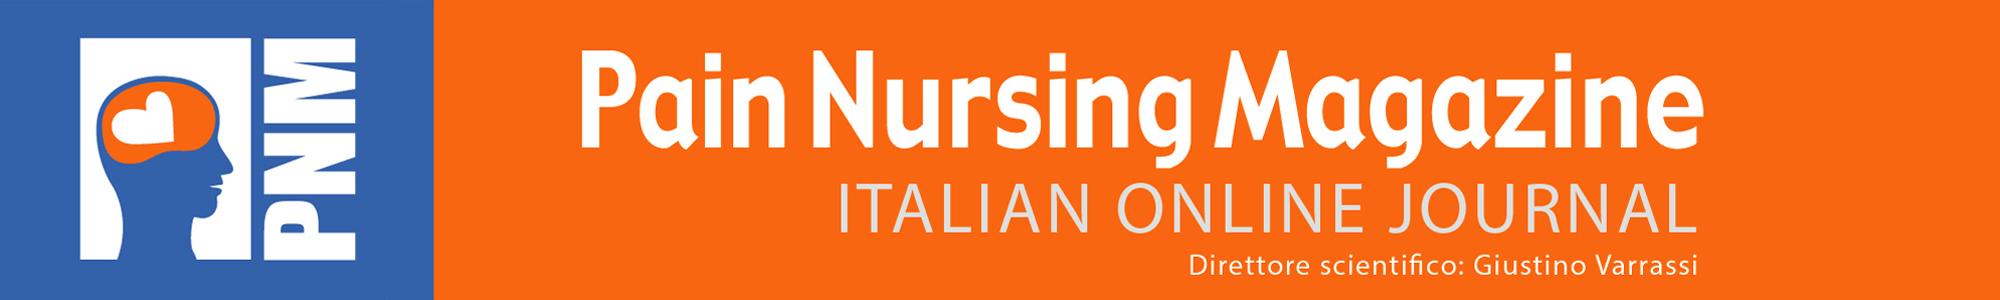 Pain Nursing Magazine